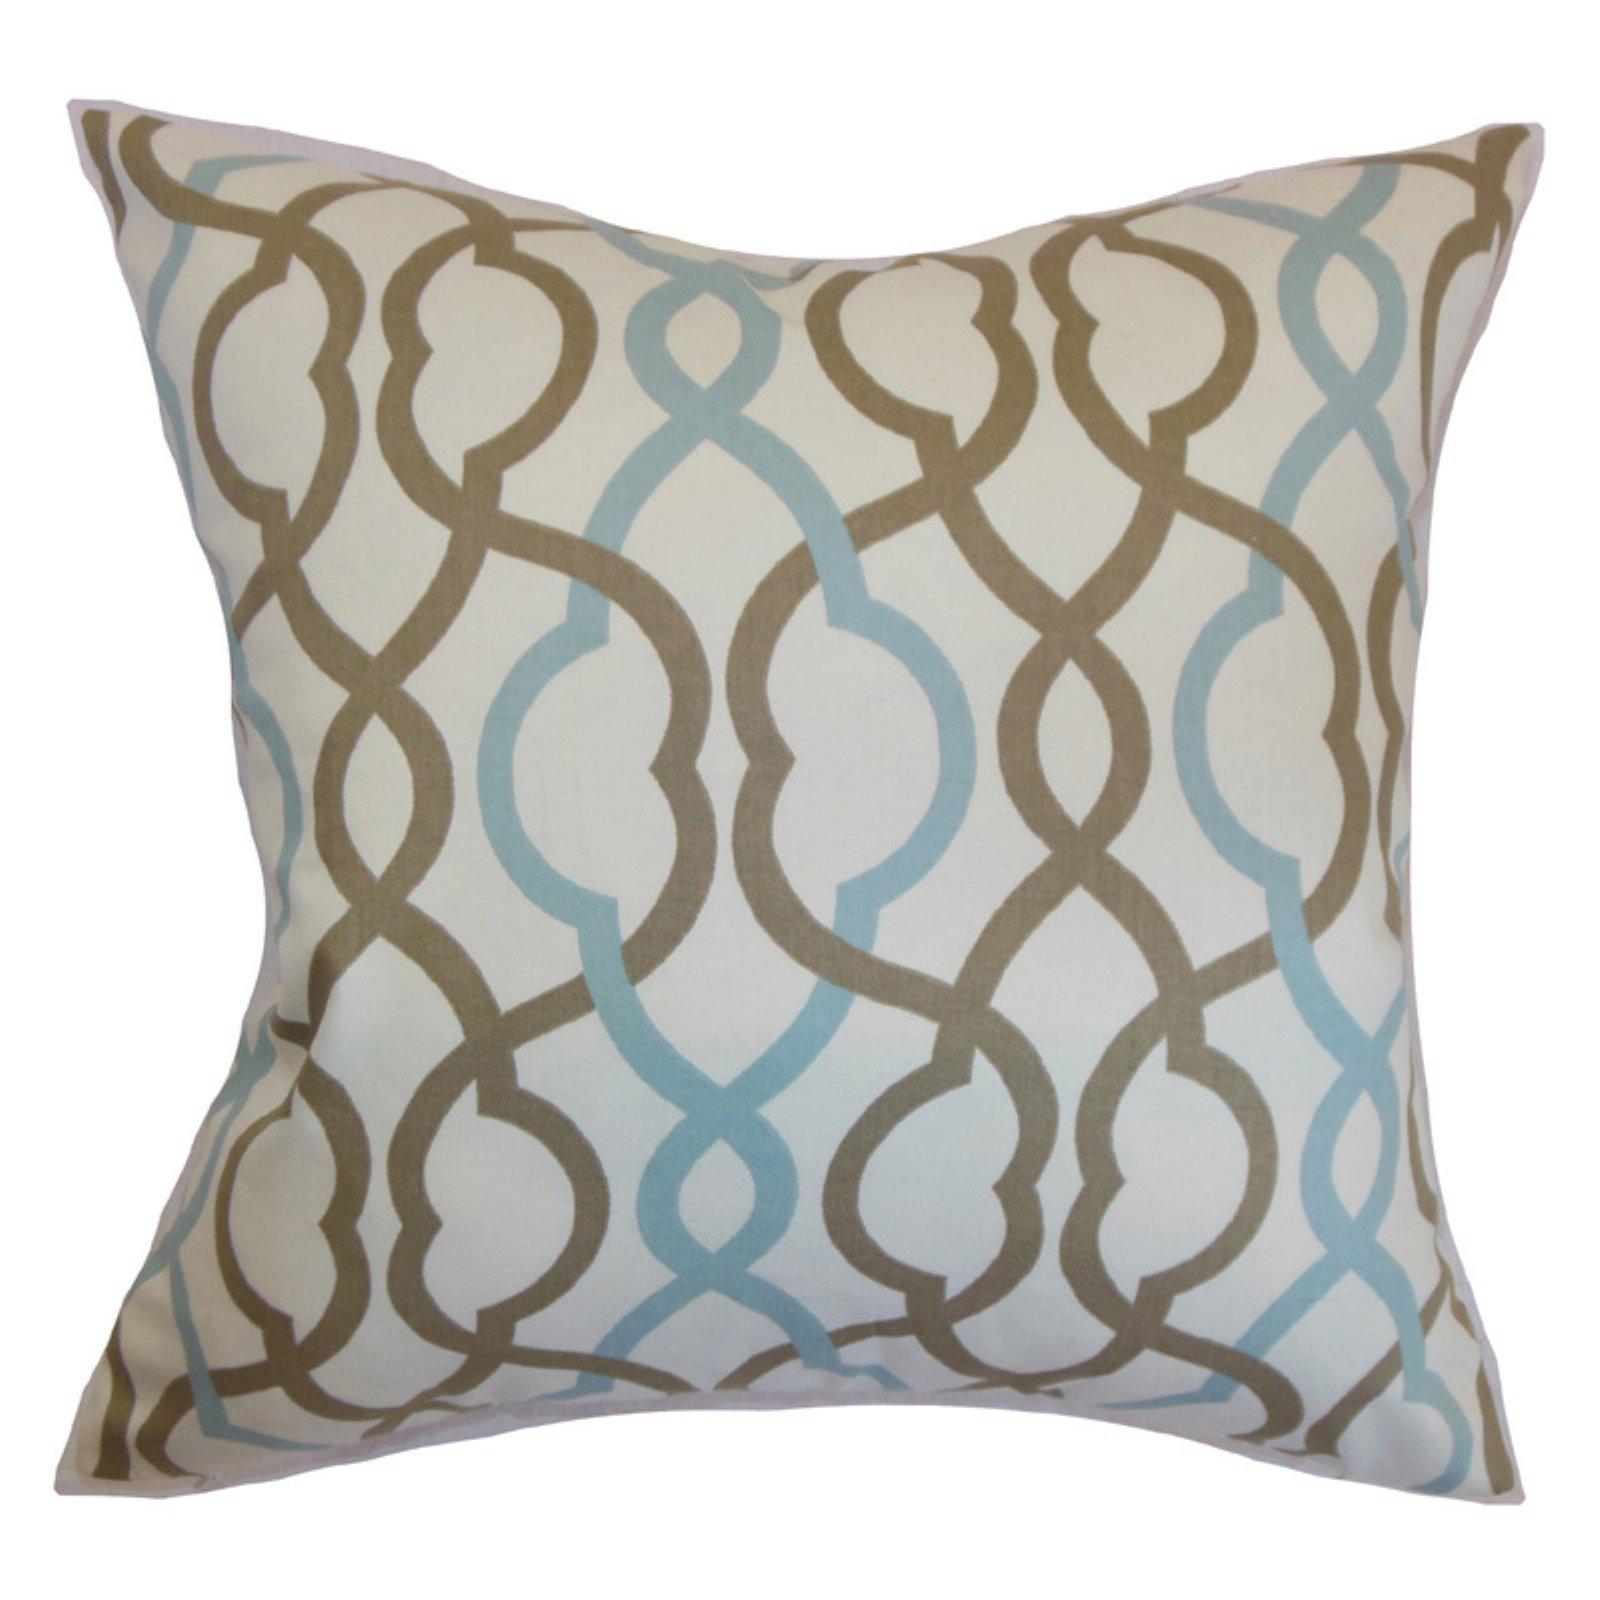 The Pillow Collection Adiyaman Moorish Geometric Pillow Aqua Cocoa The Pillow Collection Pillow Collection Geometric Pillow